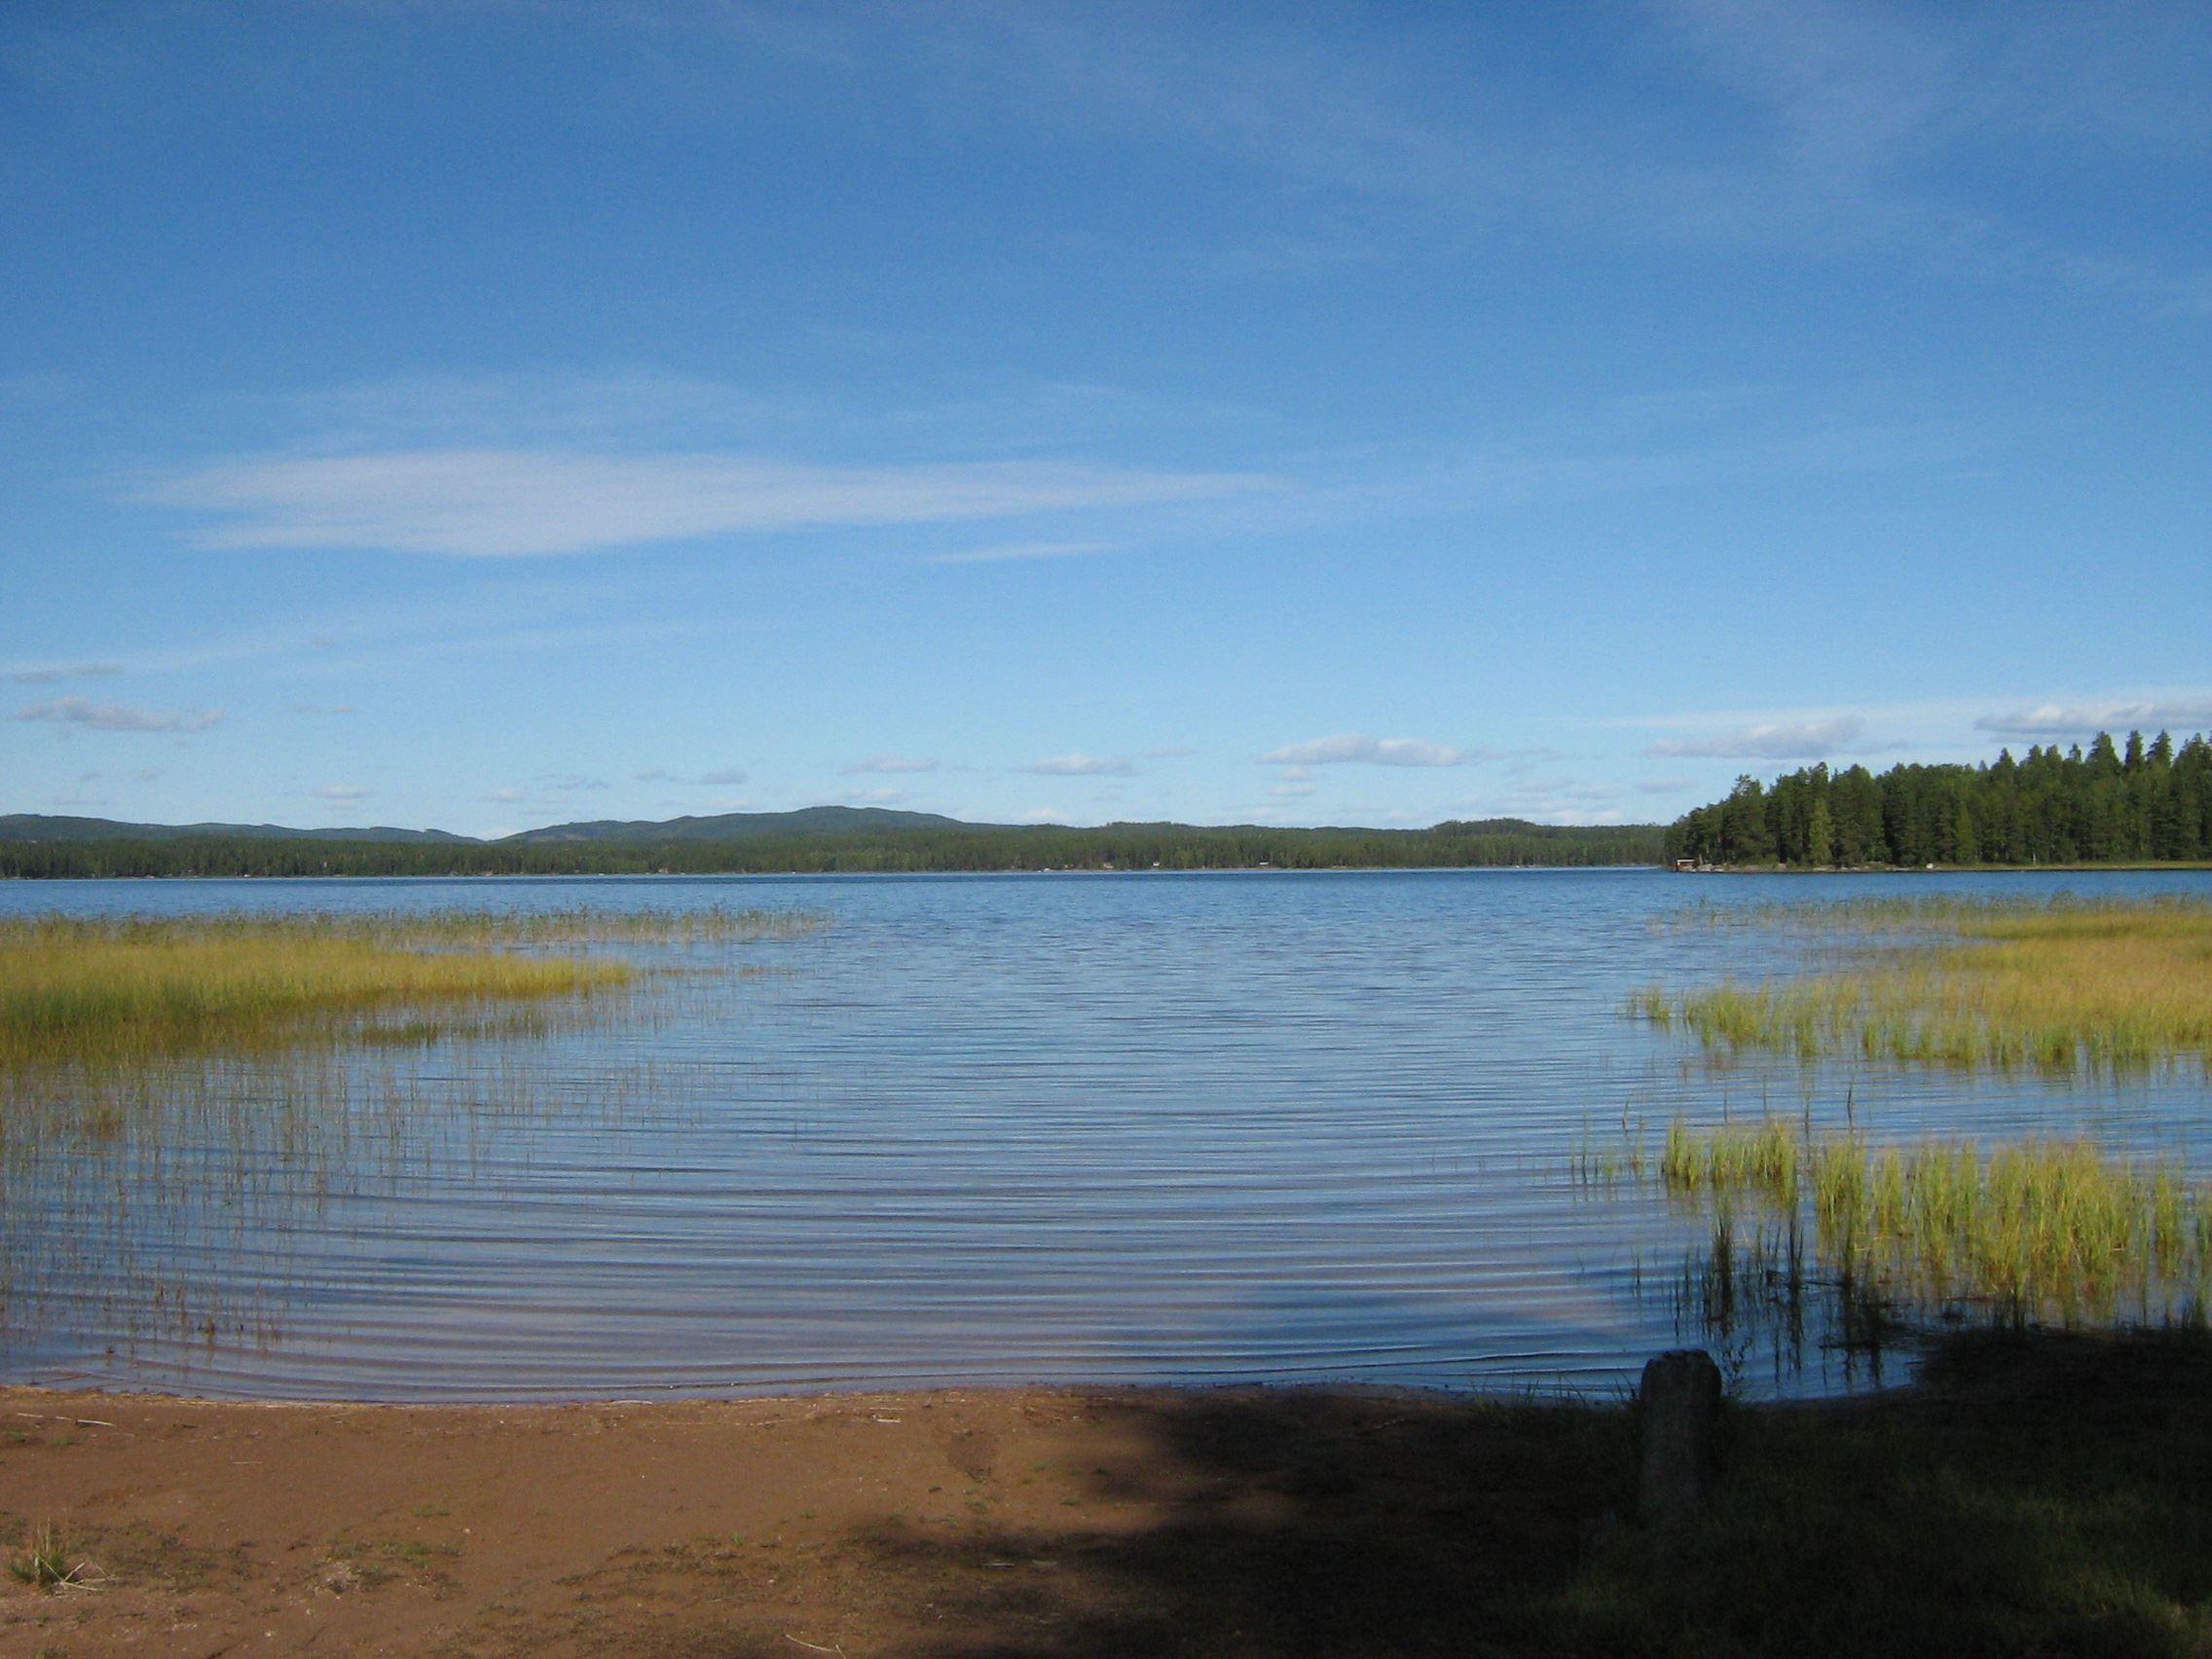 Annika Jonsson, Gensens badplats